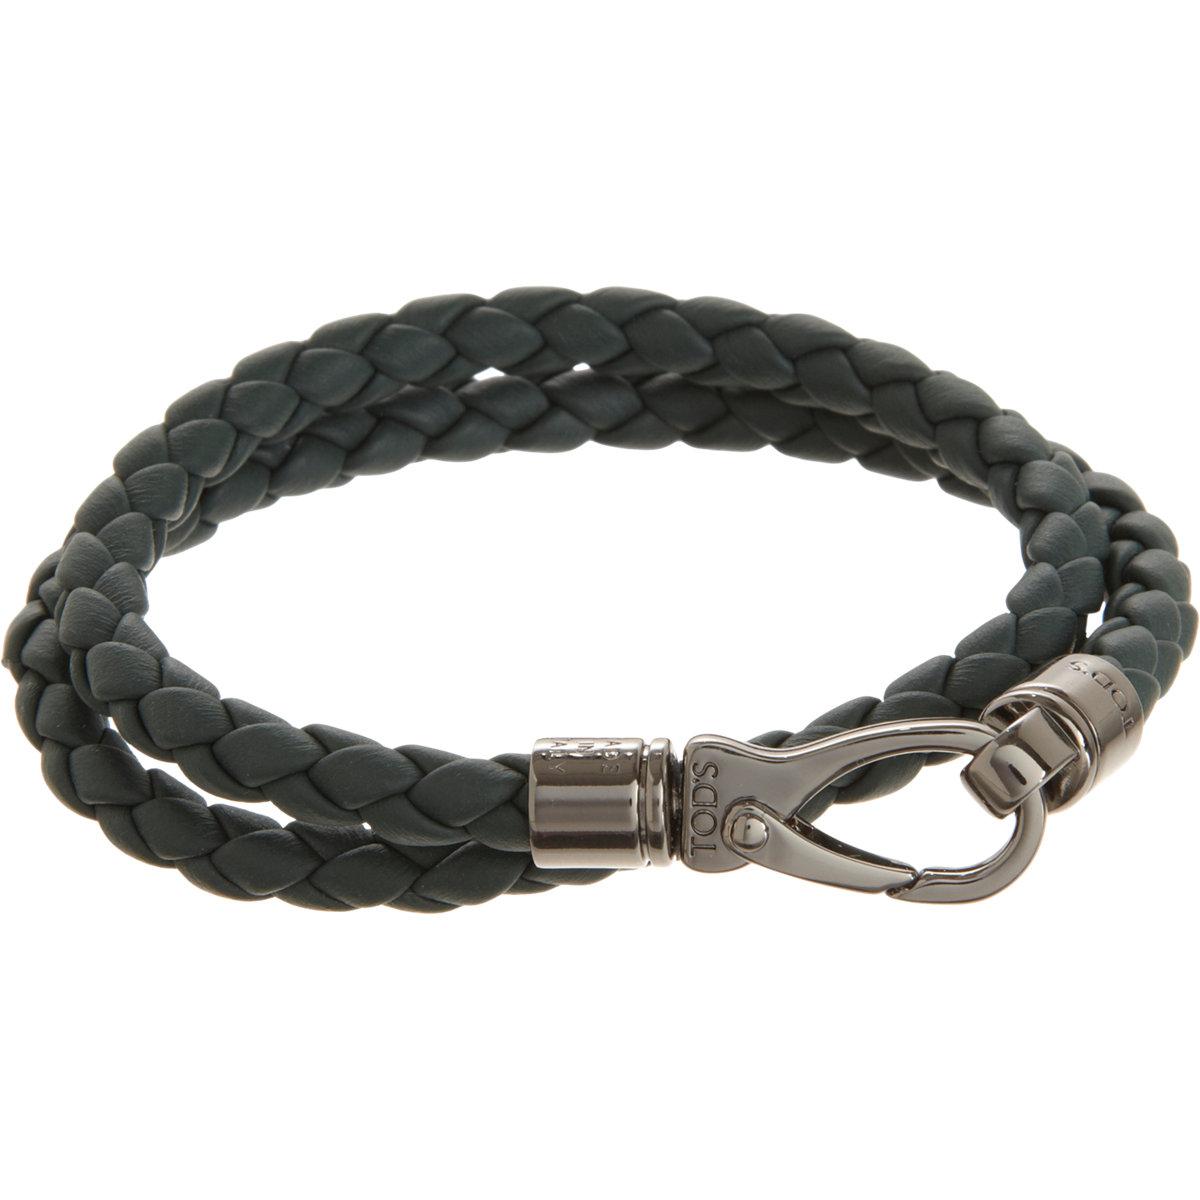 Tod's Leather Bracelet RqpmIq4Yu1